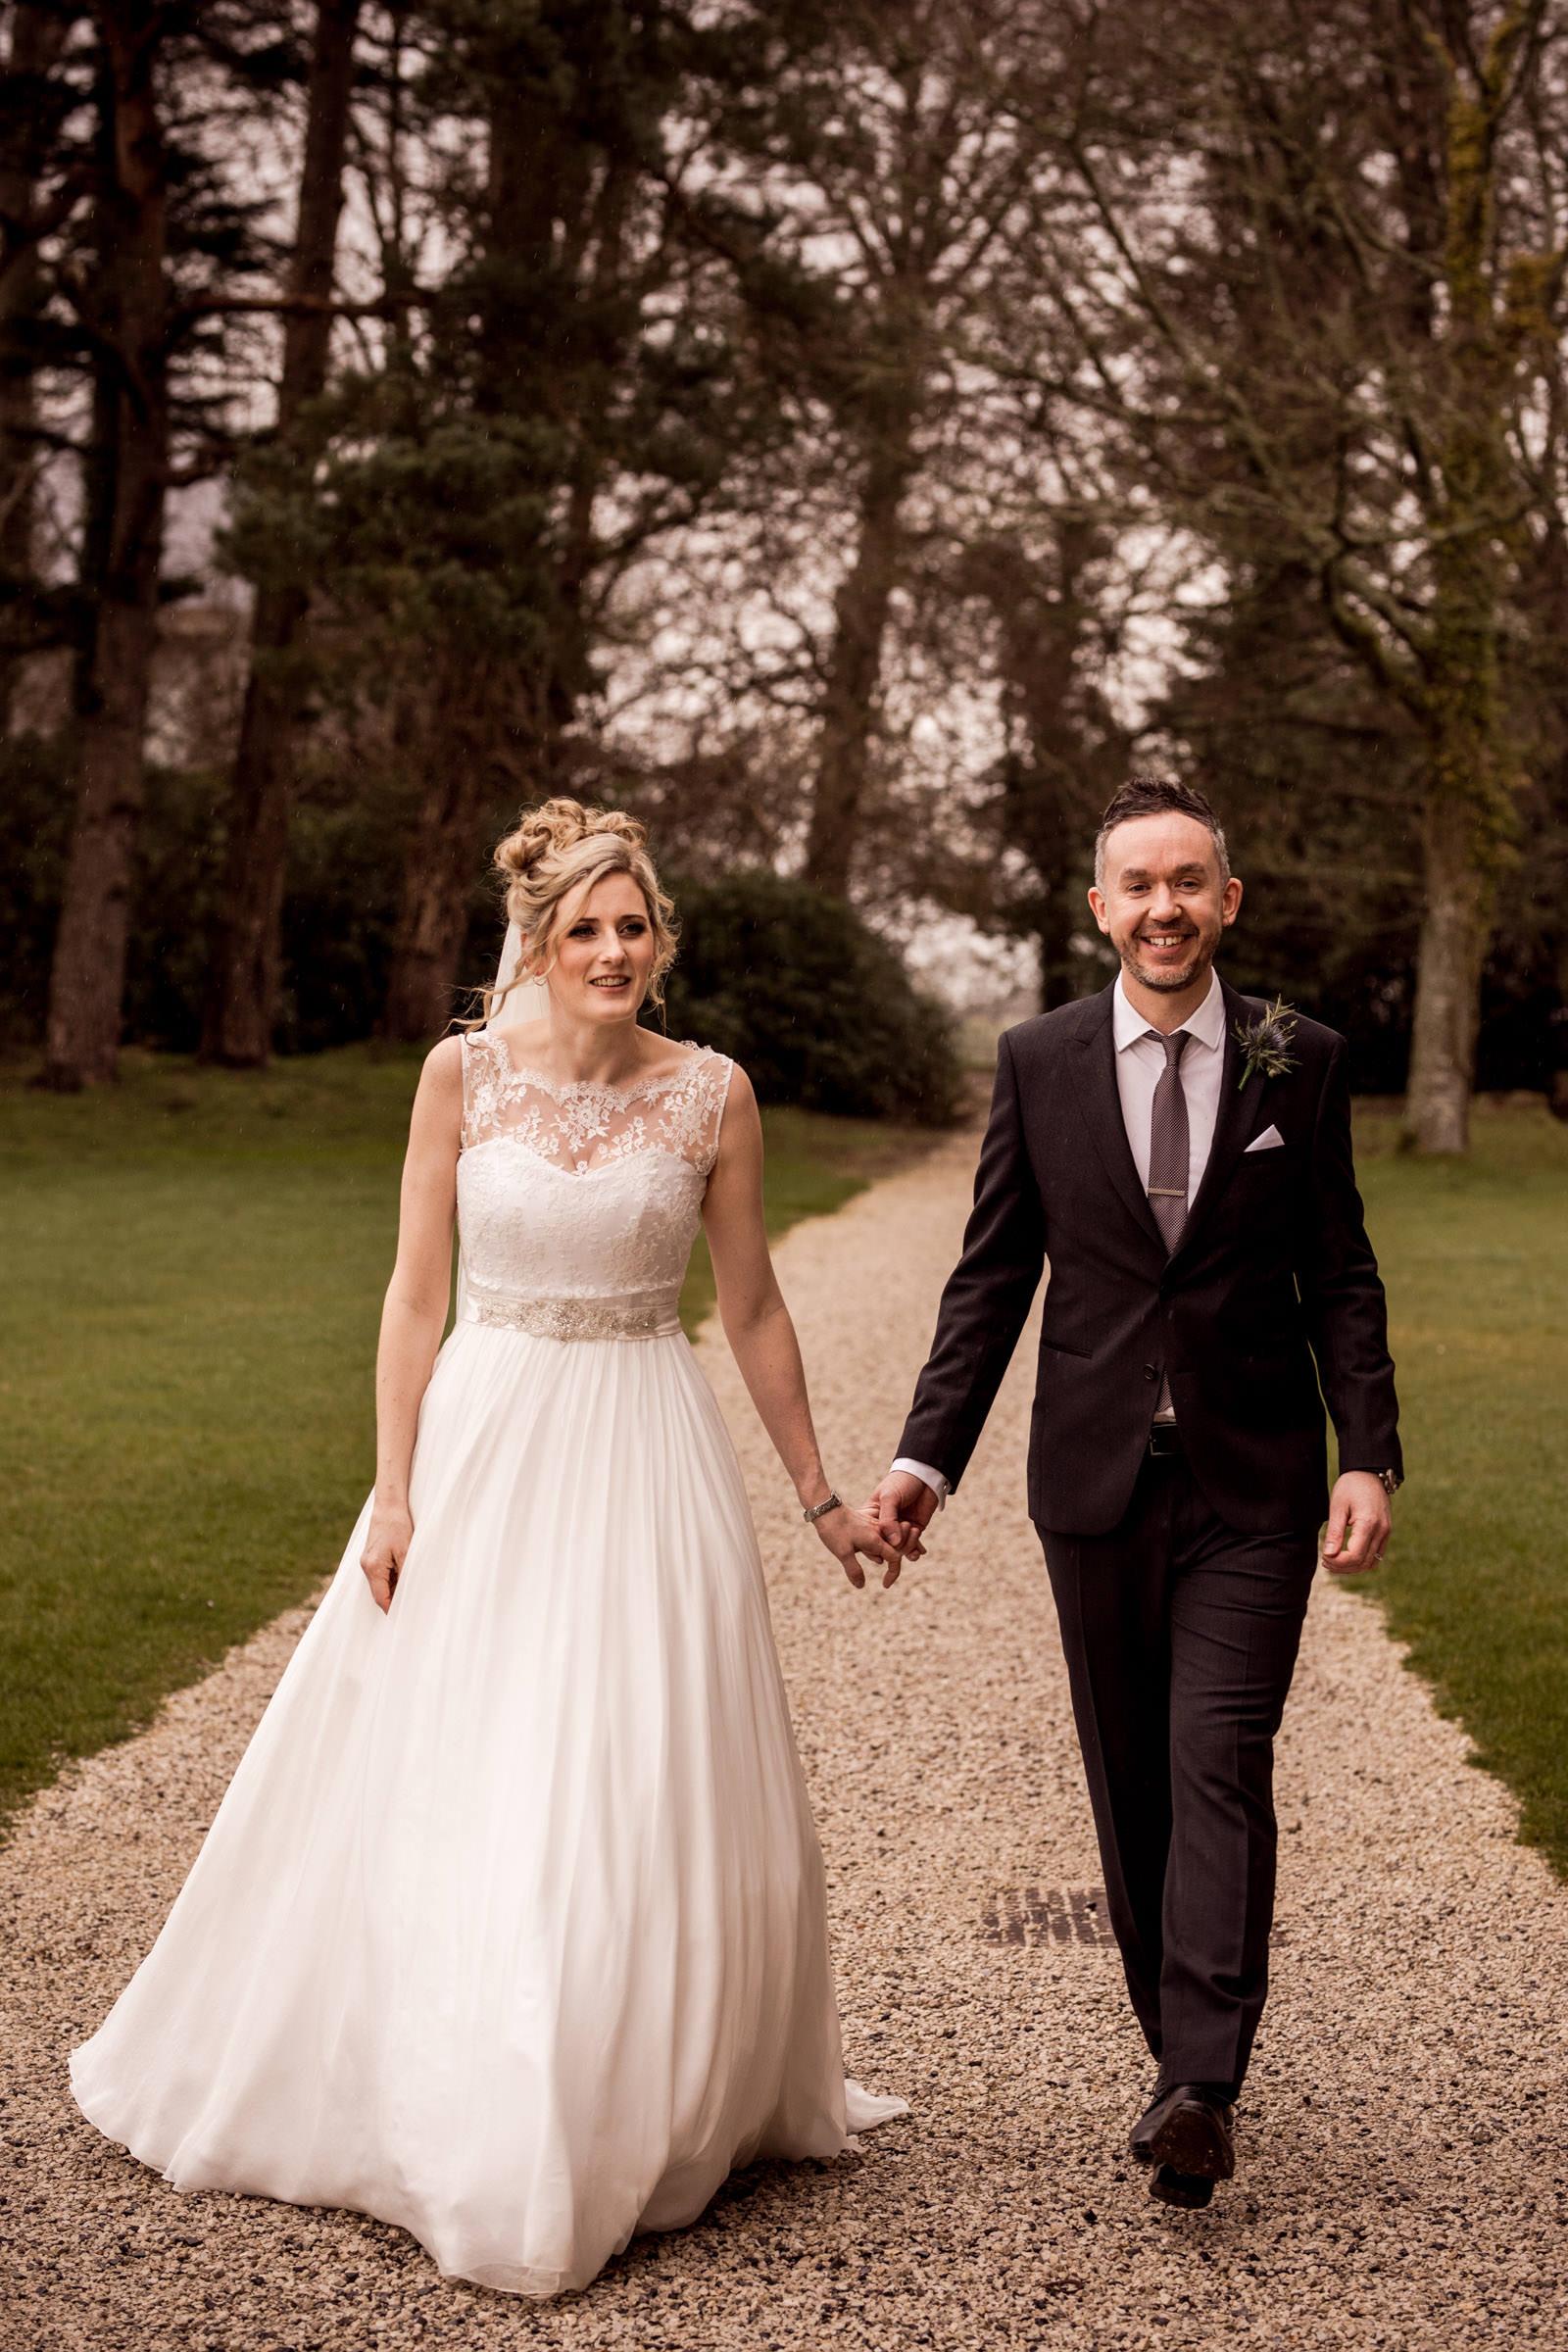 Lulworth Castle Wedding Photography 025.jpg